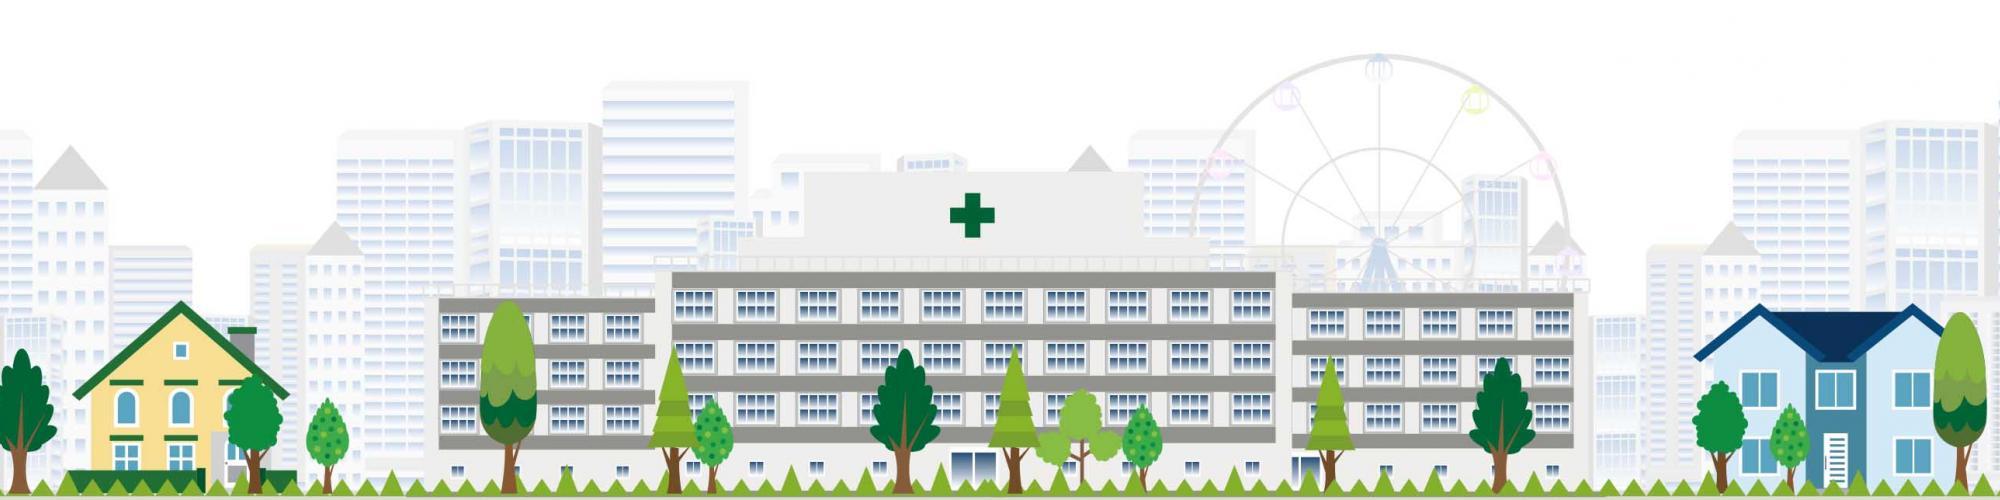 Helios Klinikum Gifhorn